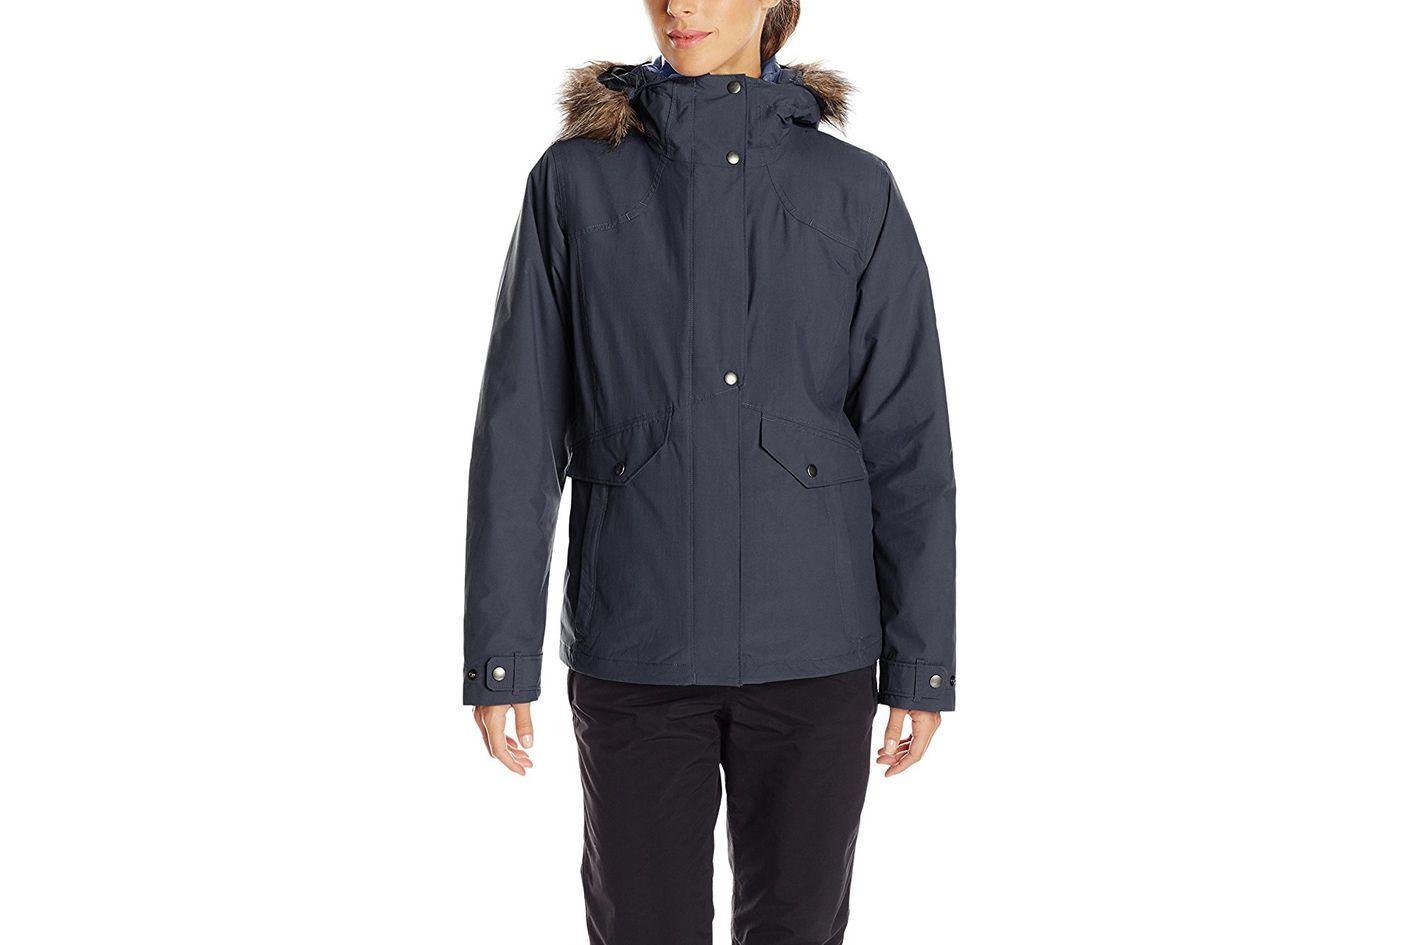 Columbia Sportswear Women's Sunset Vista Interchange Jacket